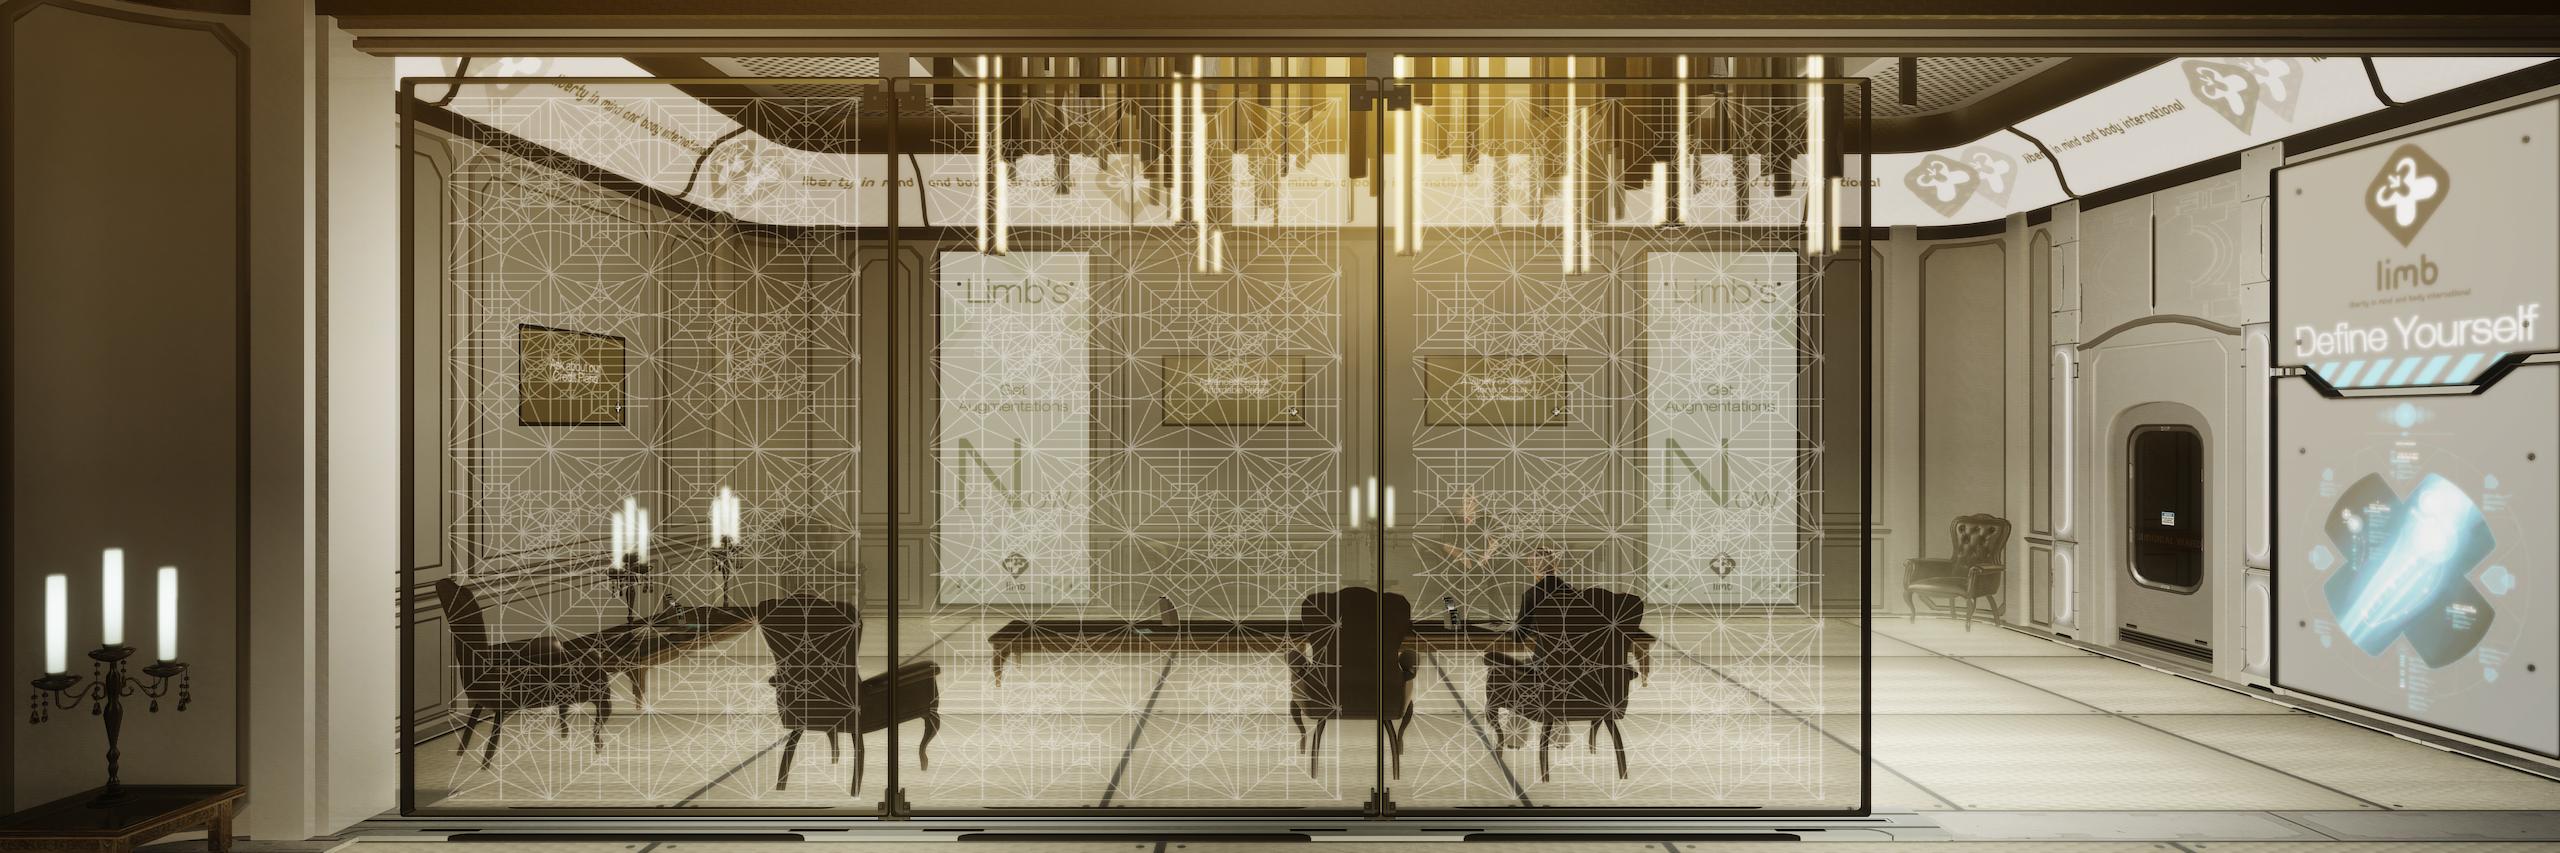 clinicalstudy.png - Deus Ex: Human Revolution